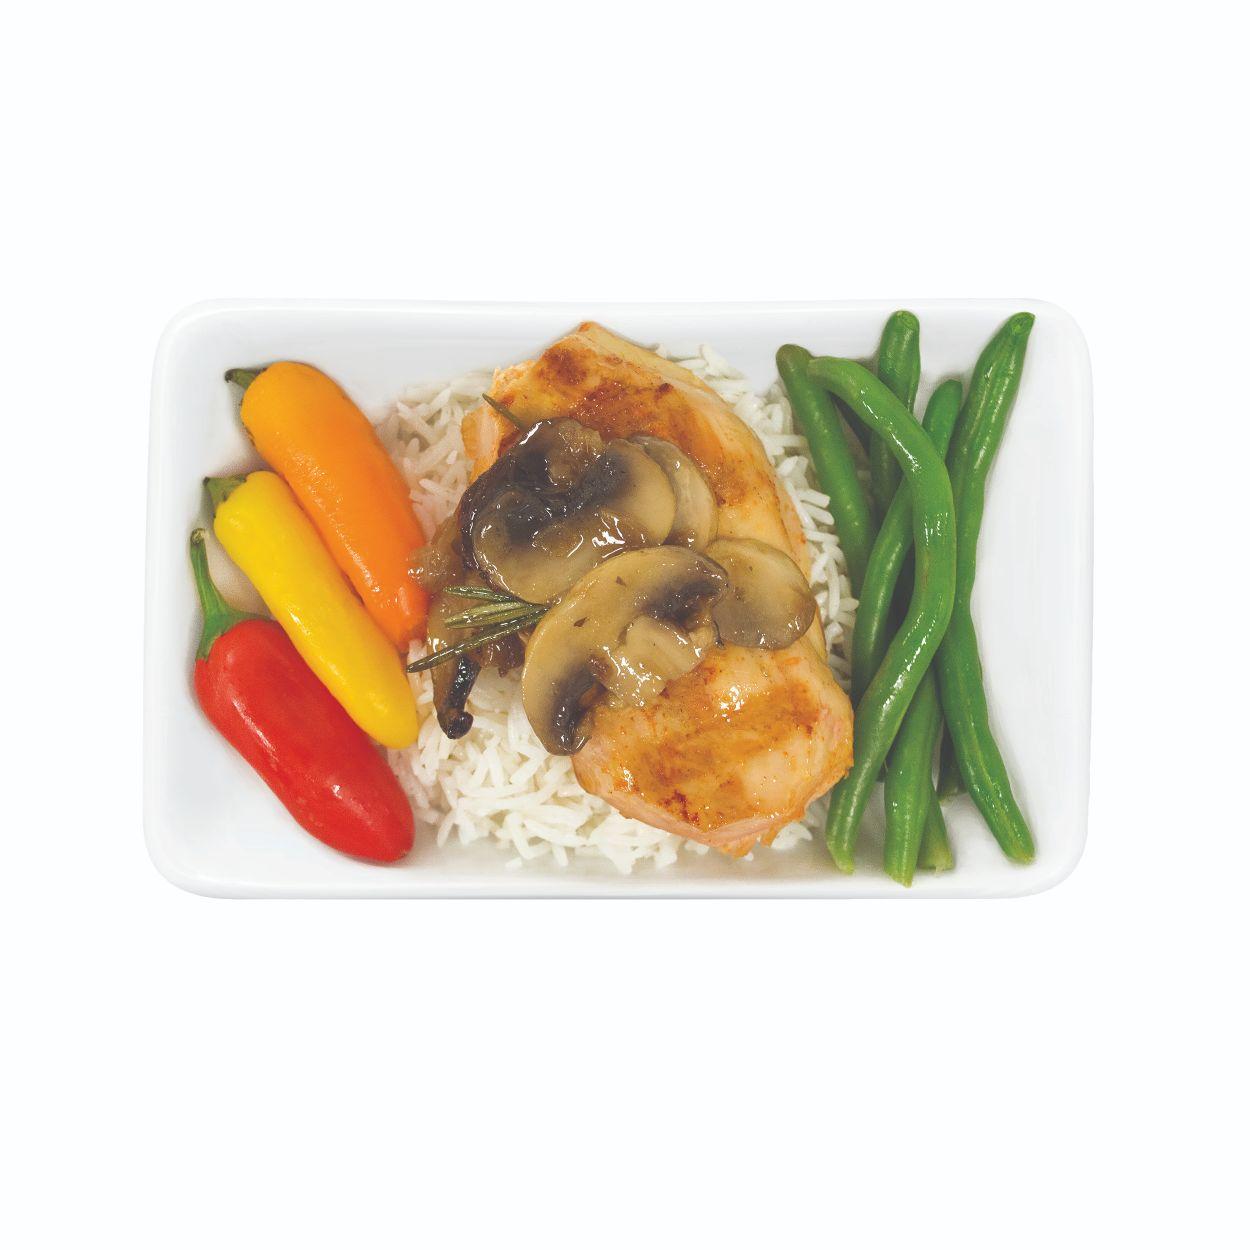 kosher travel meals